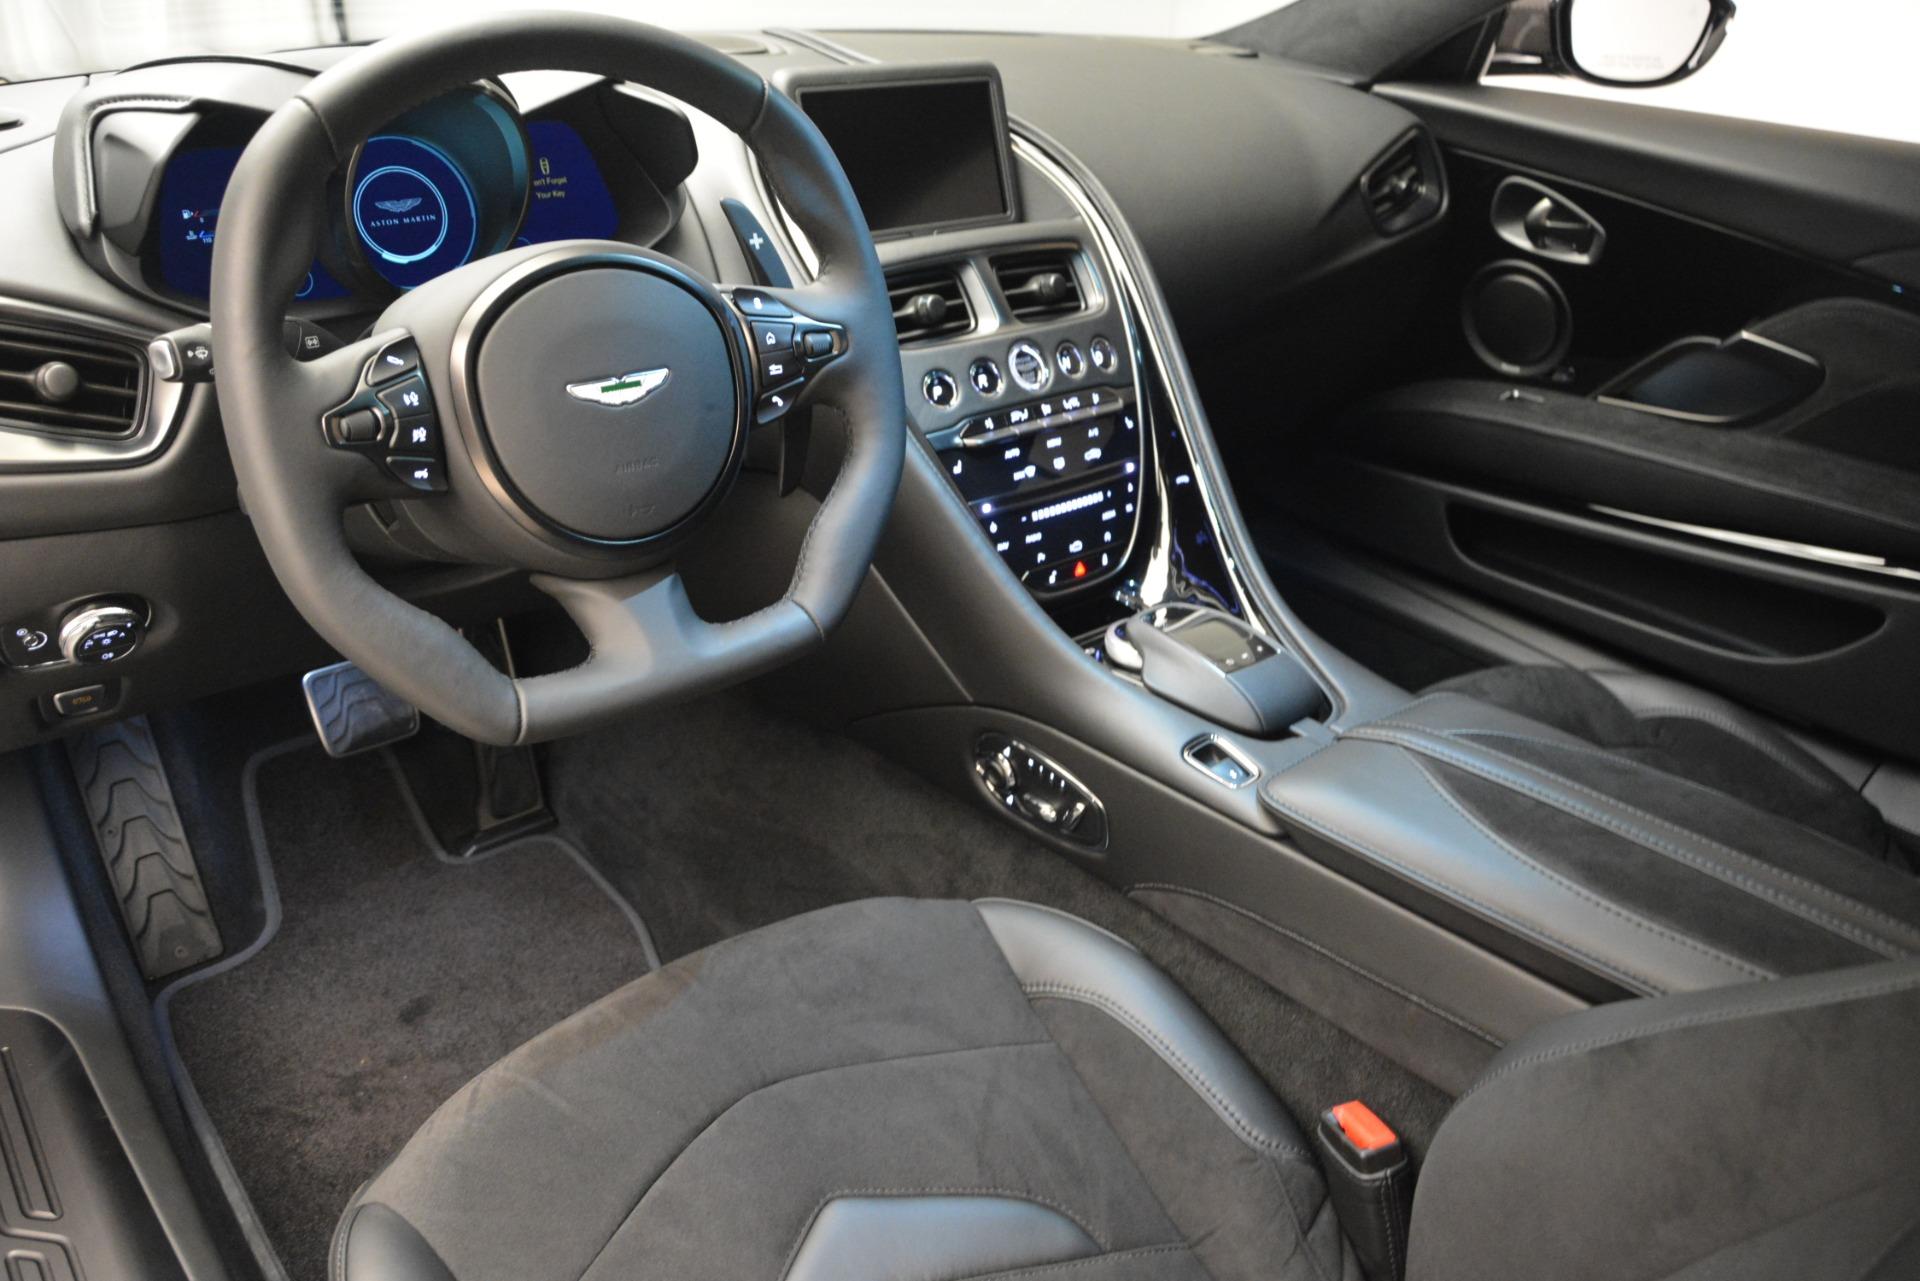 Used 2019 Aston Martin DBS Superleggera For Sale In Greenwich, CT 2917_p16